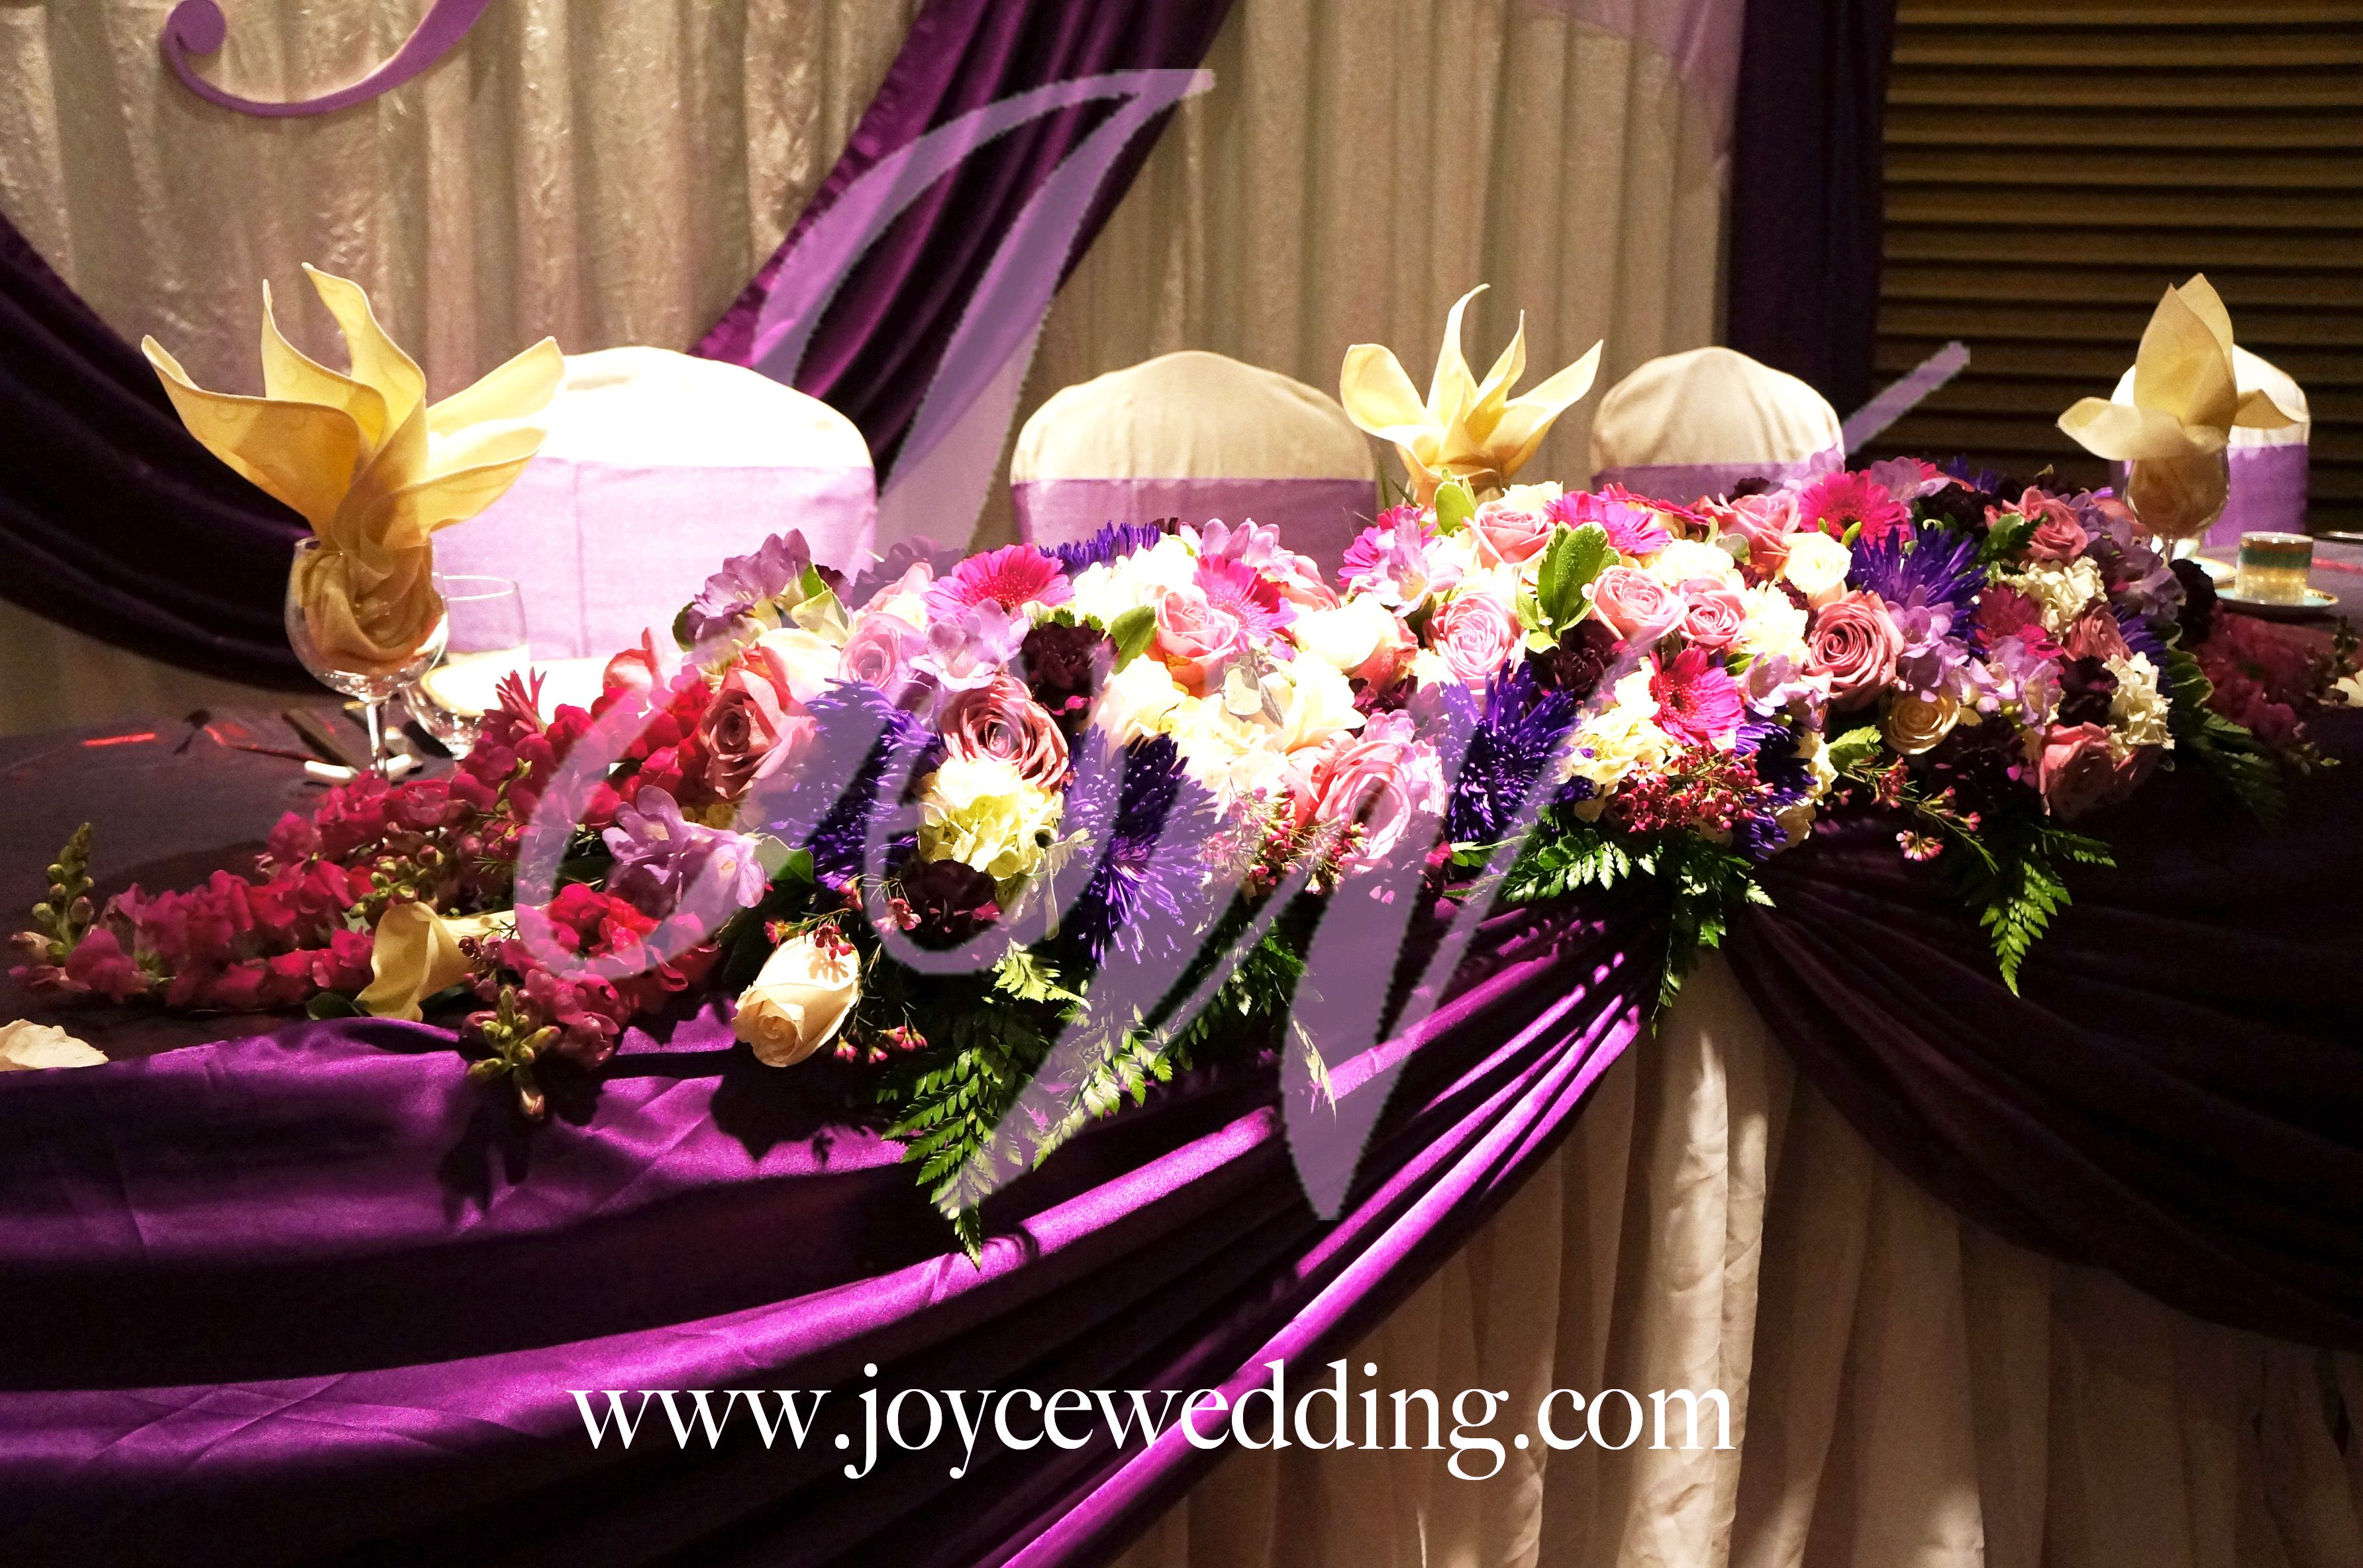 #Reception #Headtable #Floral #Arrangement #Purple And #Pink Hues